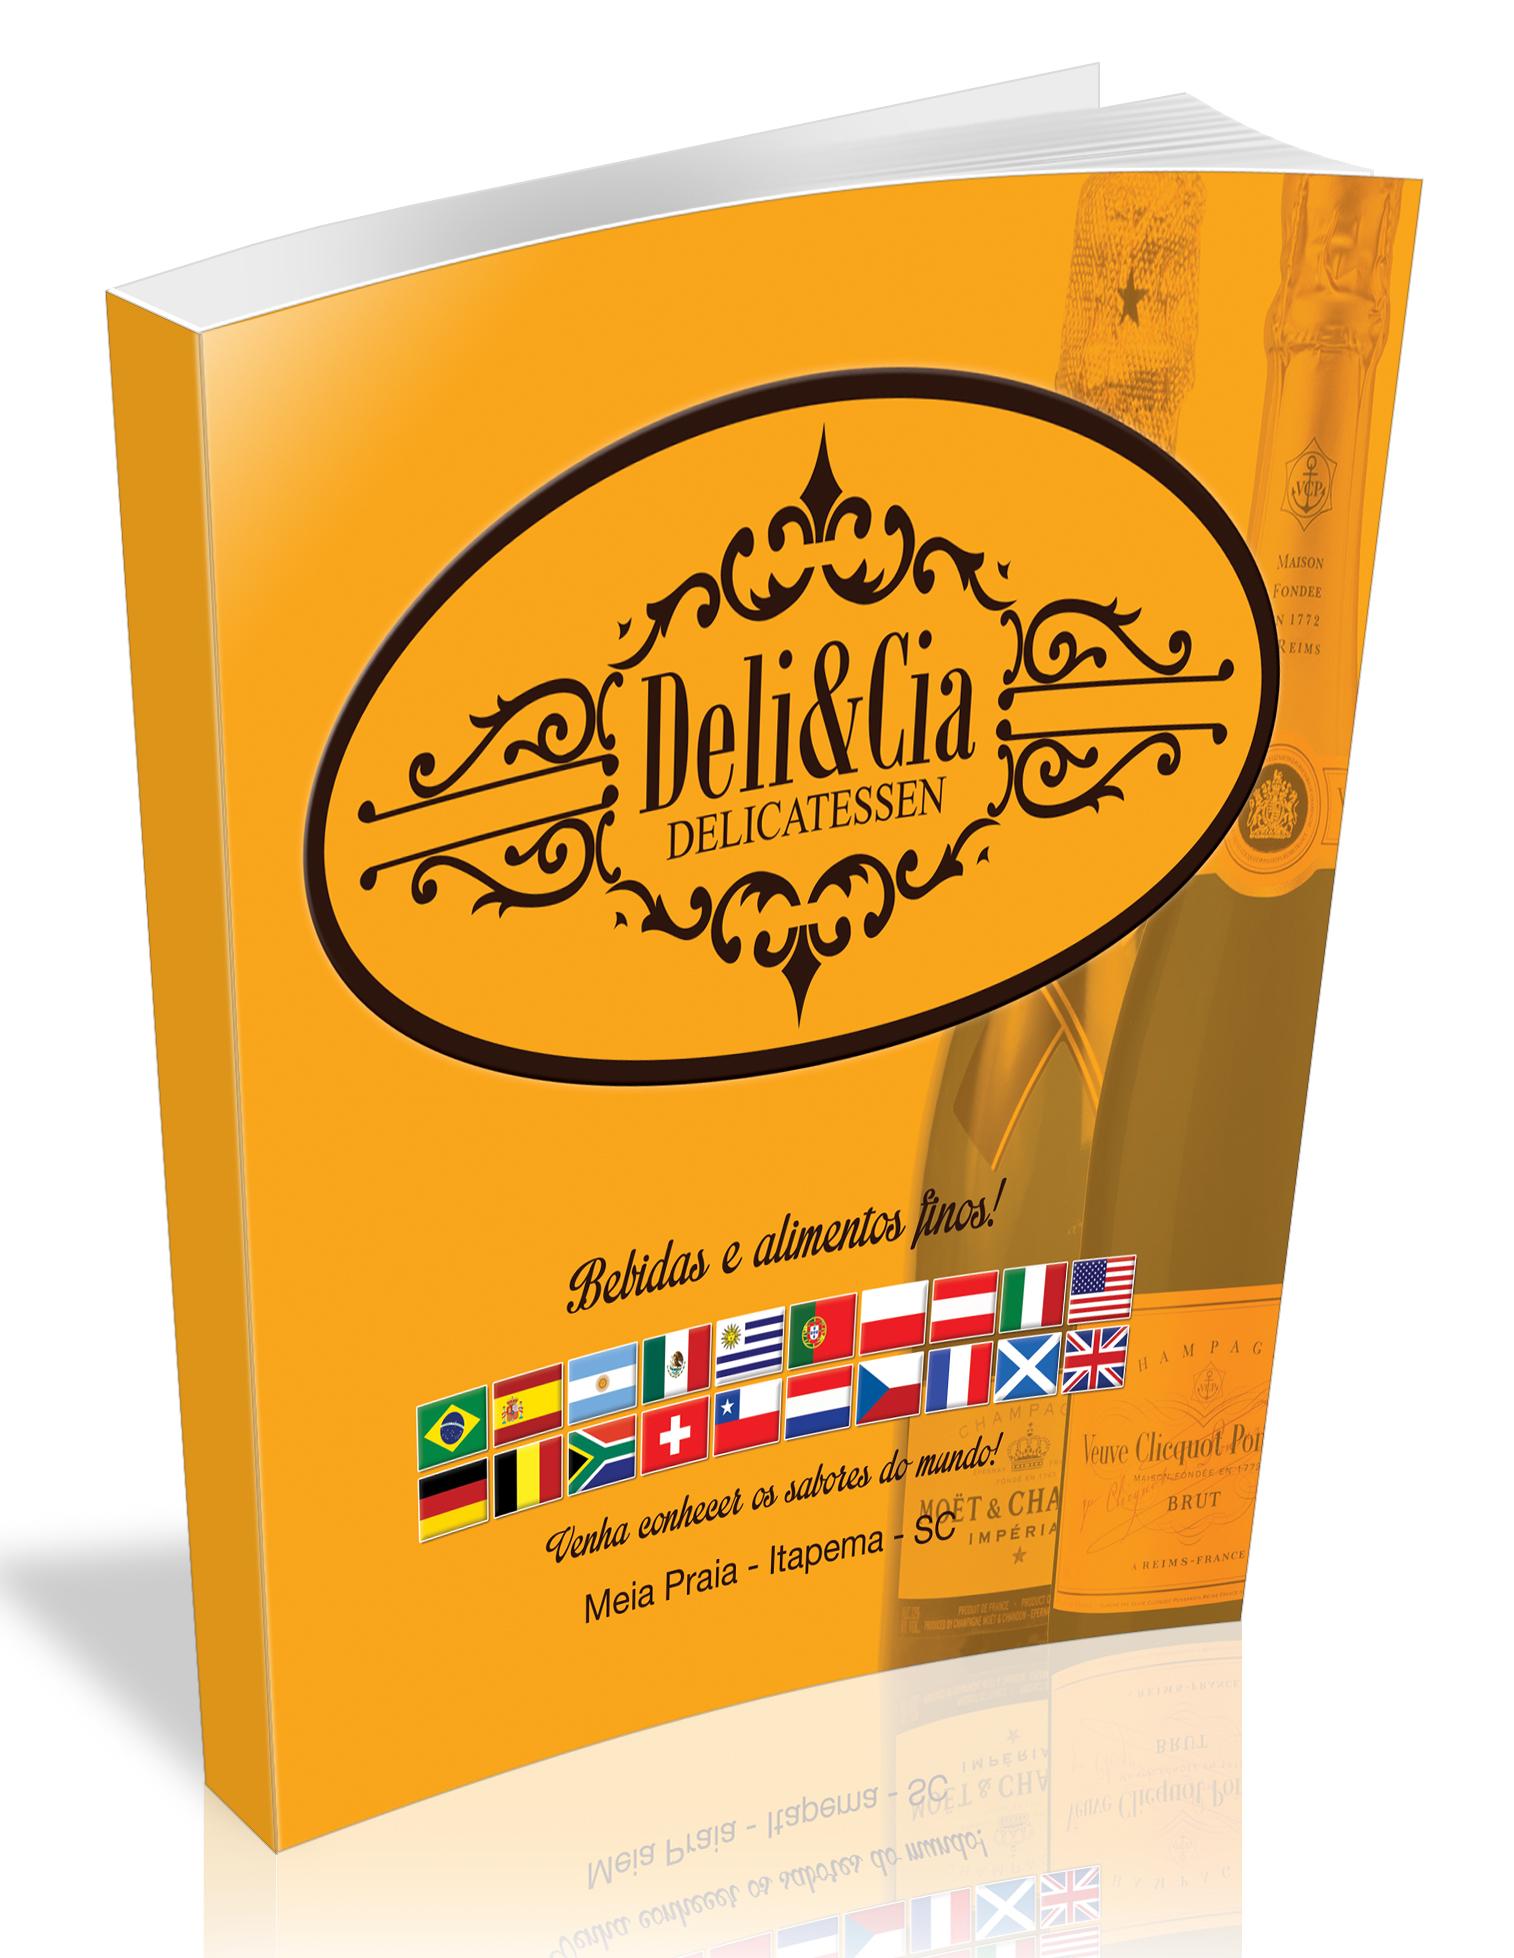 Catálogo Deli&Cia